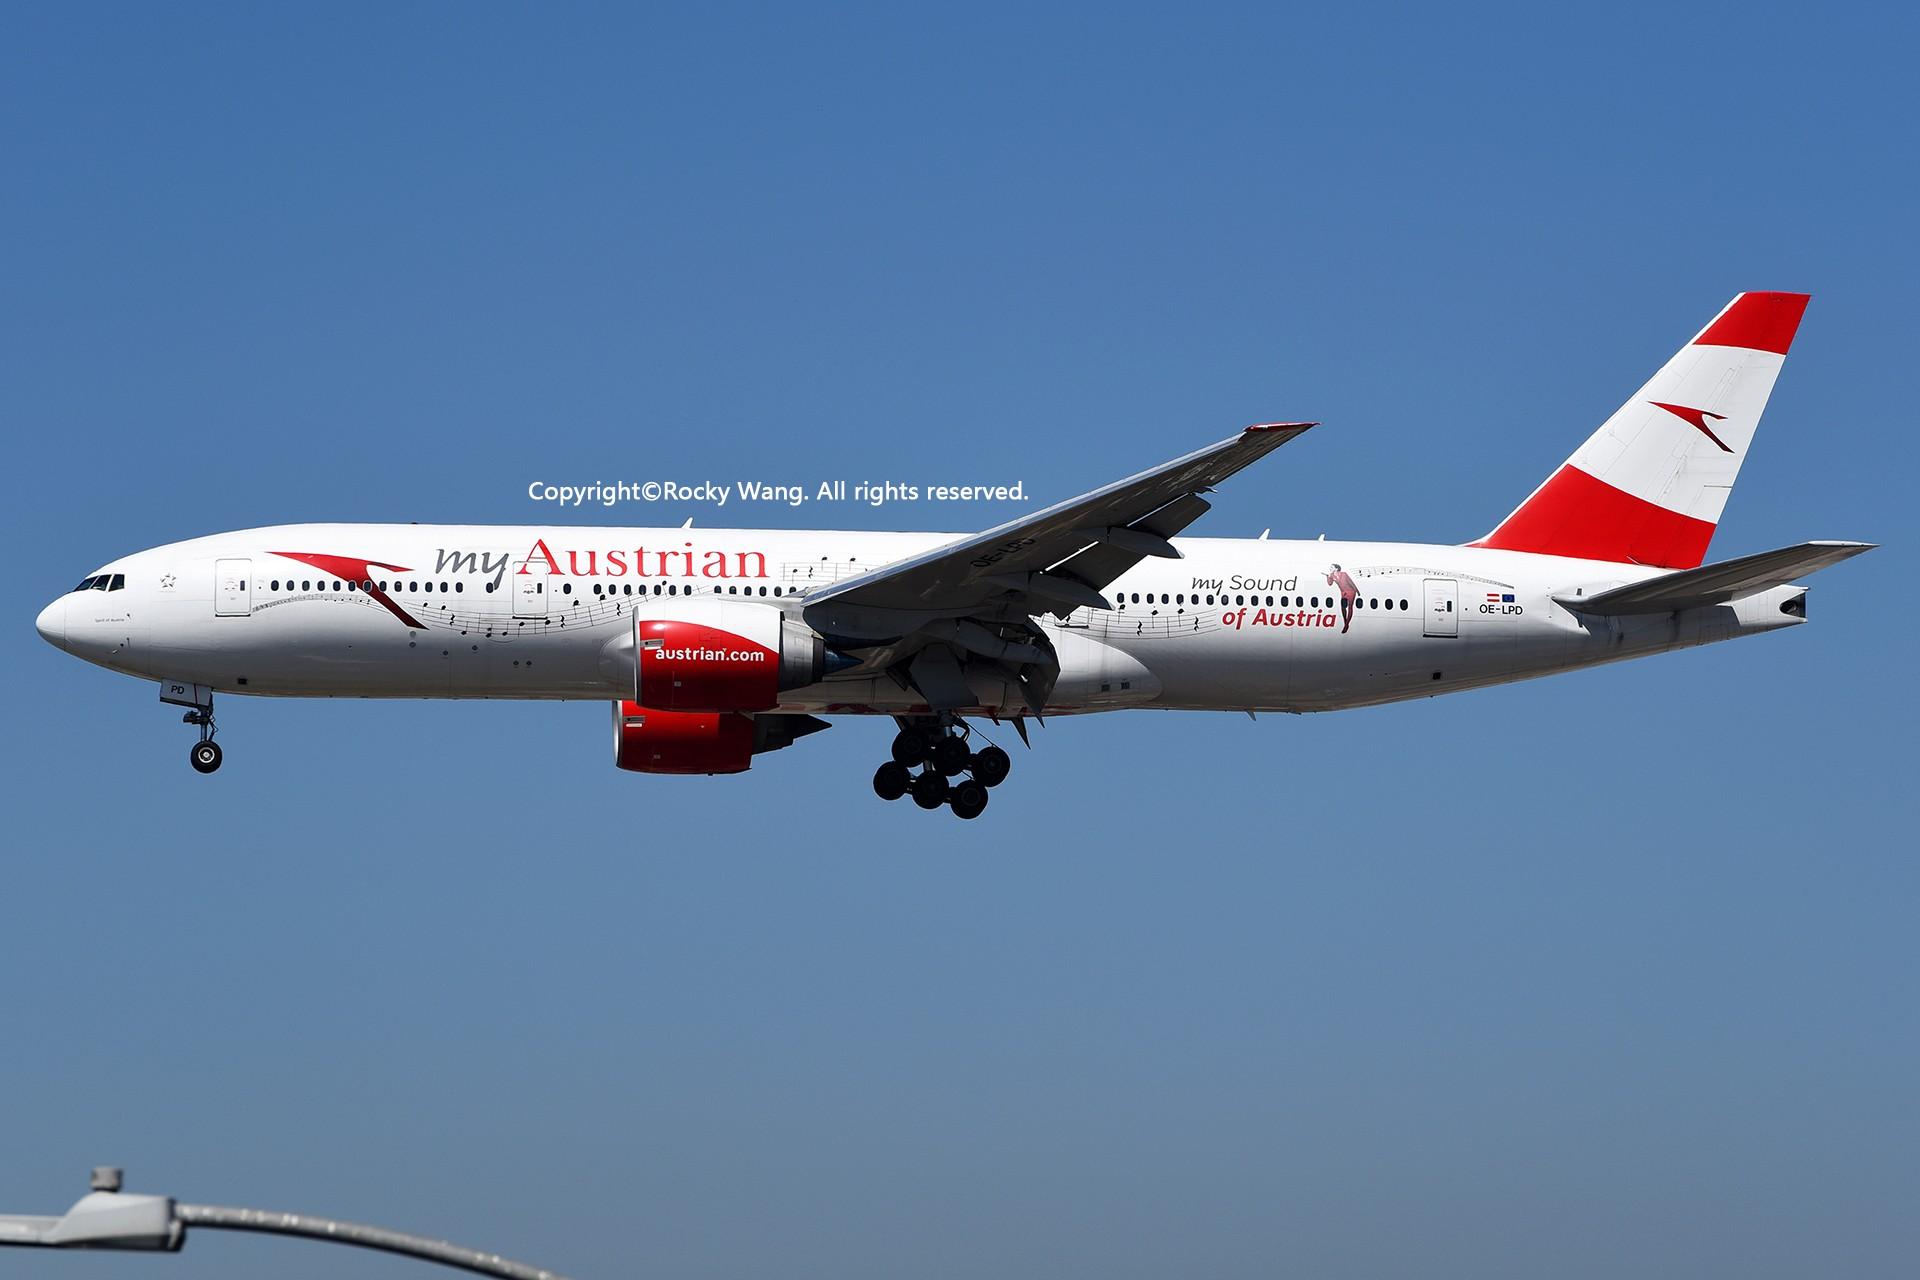 Re:[原创]彩绘圣地-附加彩蛋 BOEING 777-2Z9(ER) OE-LPD Los Angeles Int'l Airport